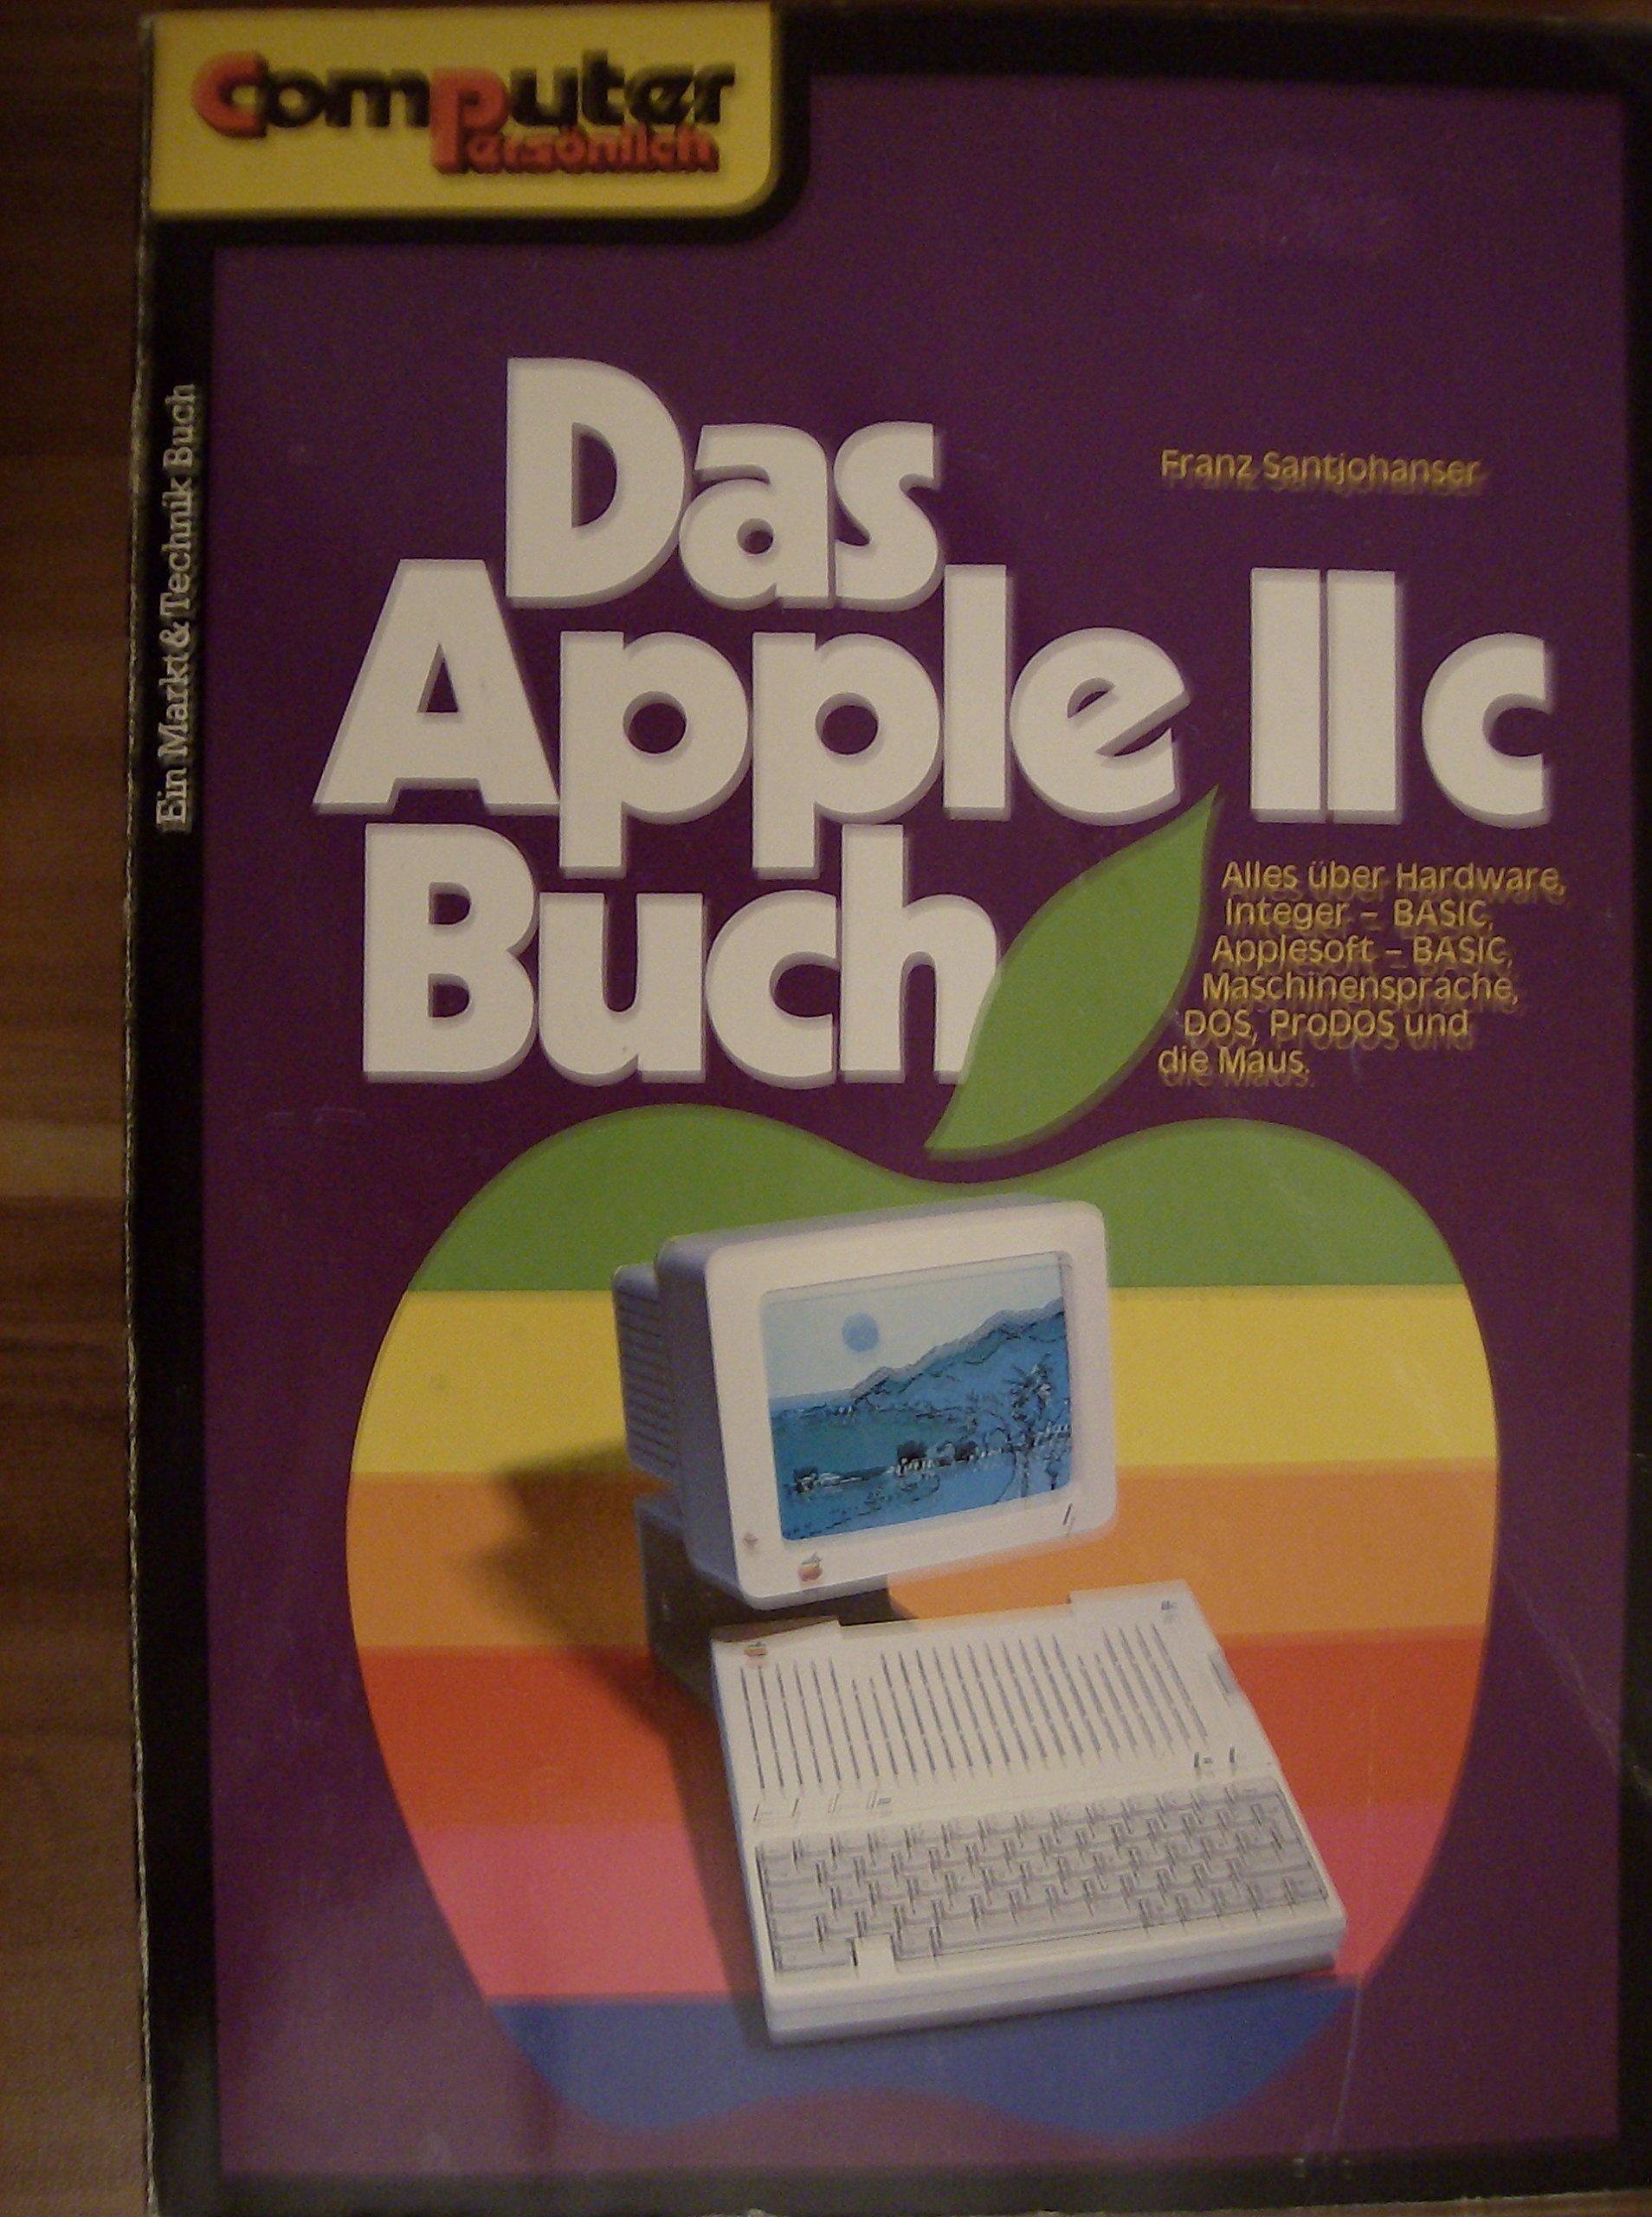 Das Apple IIc Buch. Alles über Hardware, Integer-BASIC, Applesoft ...